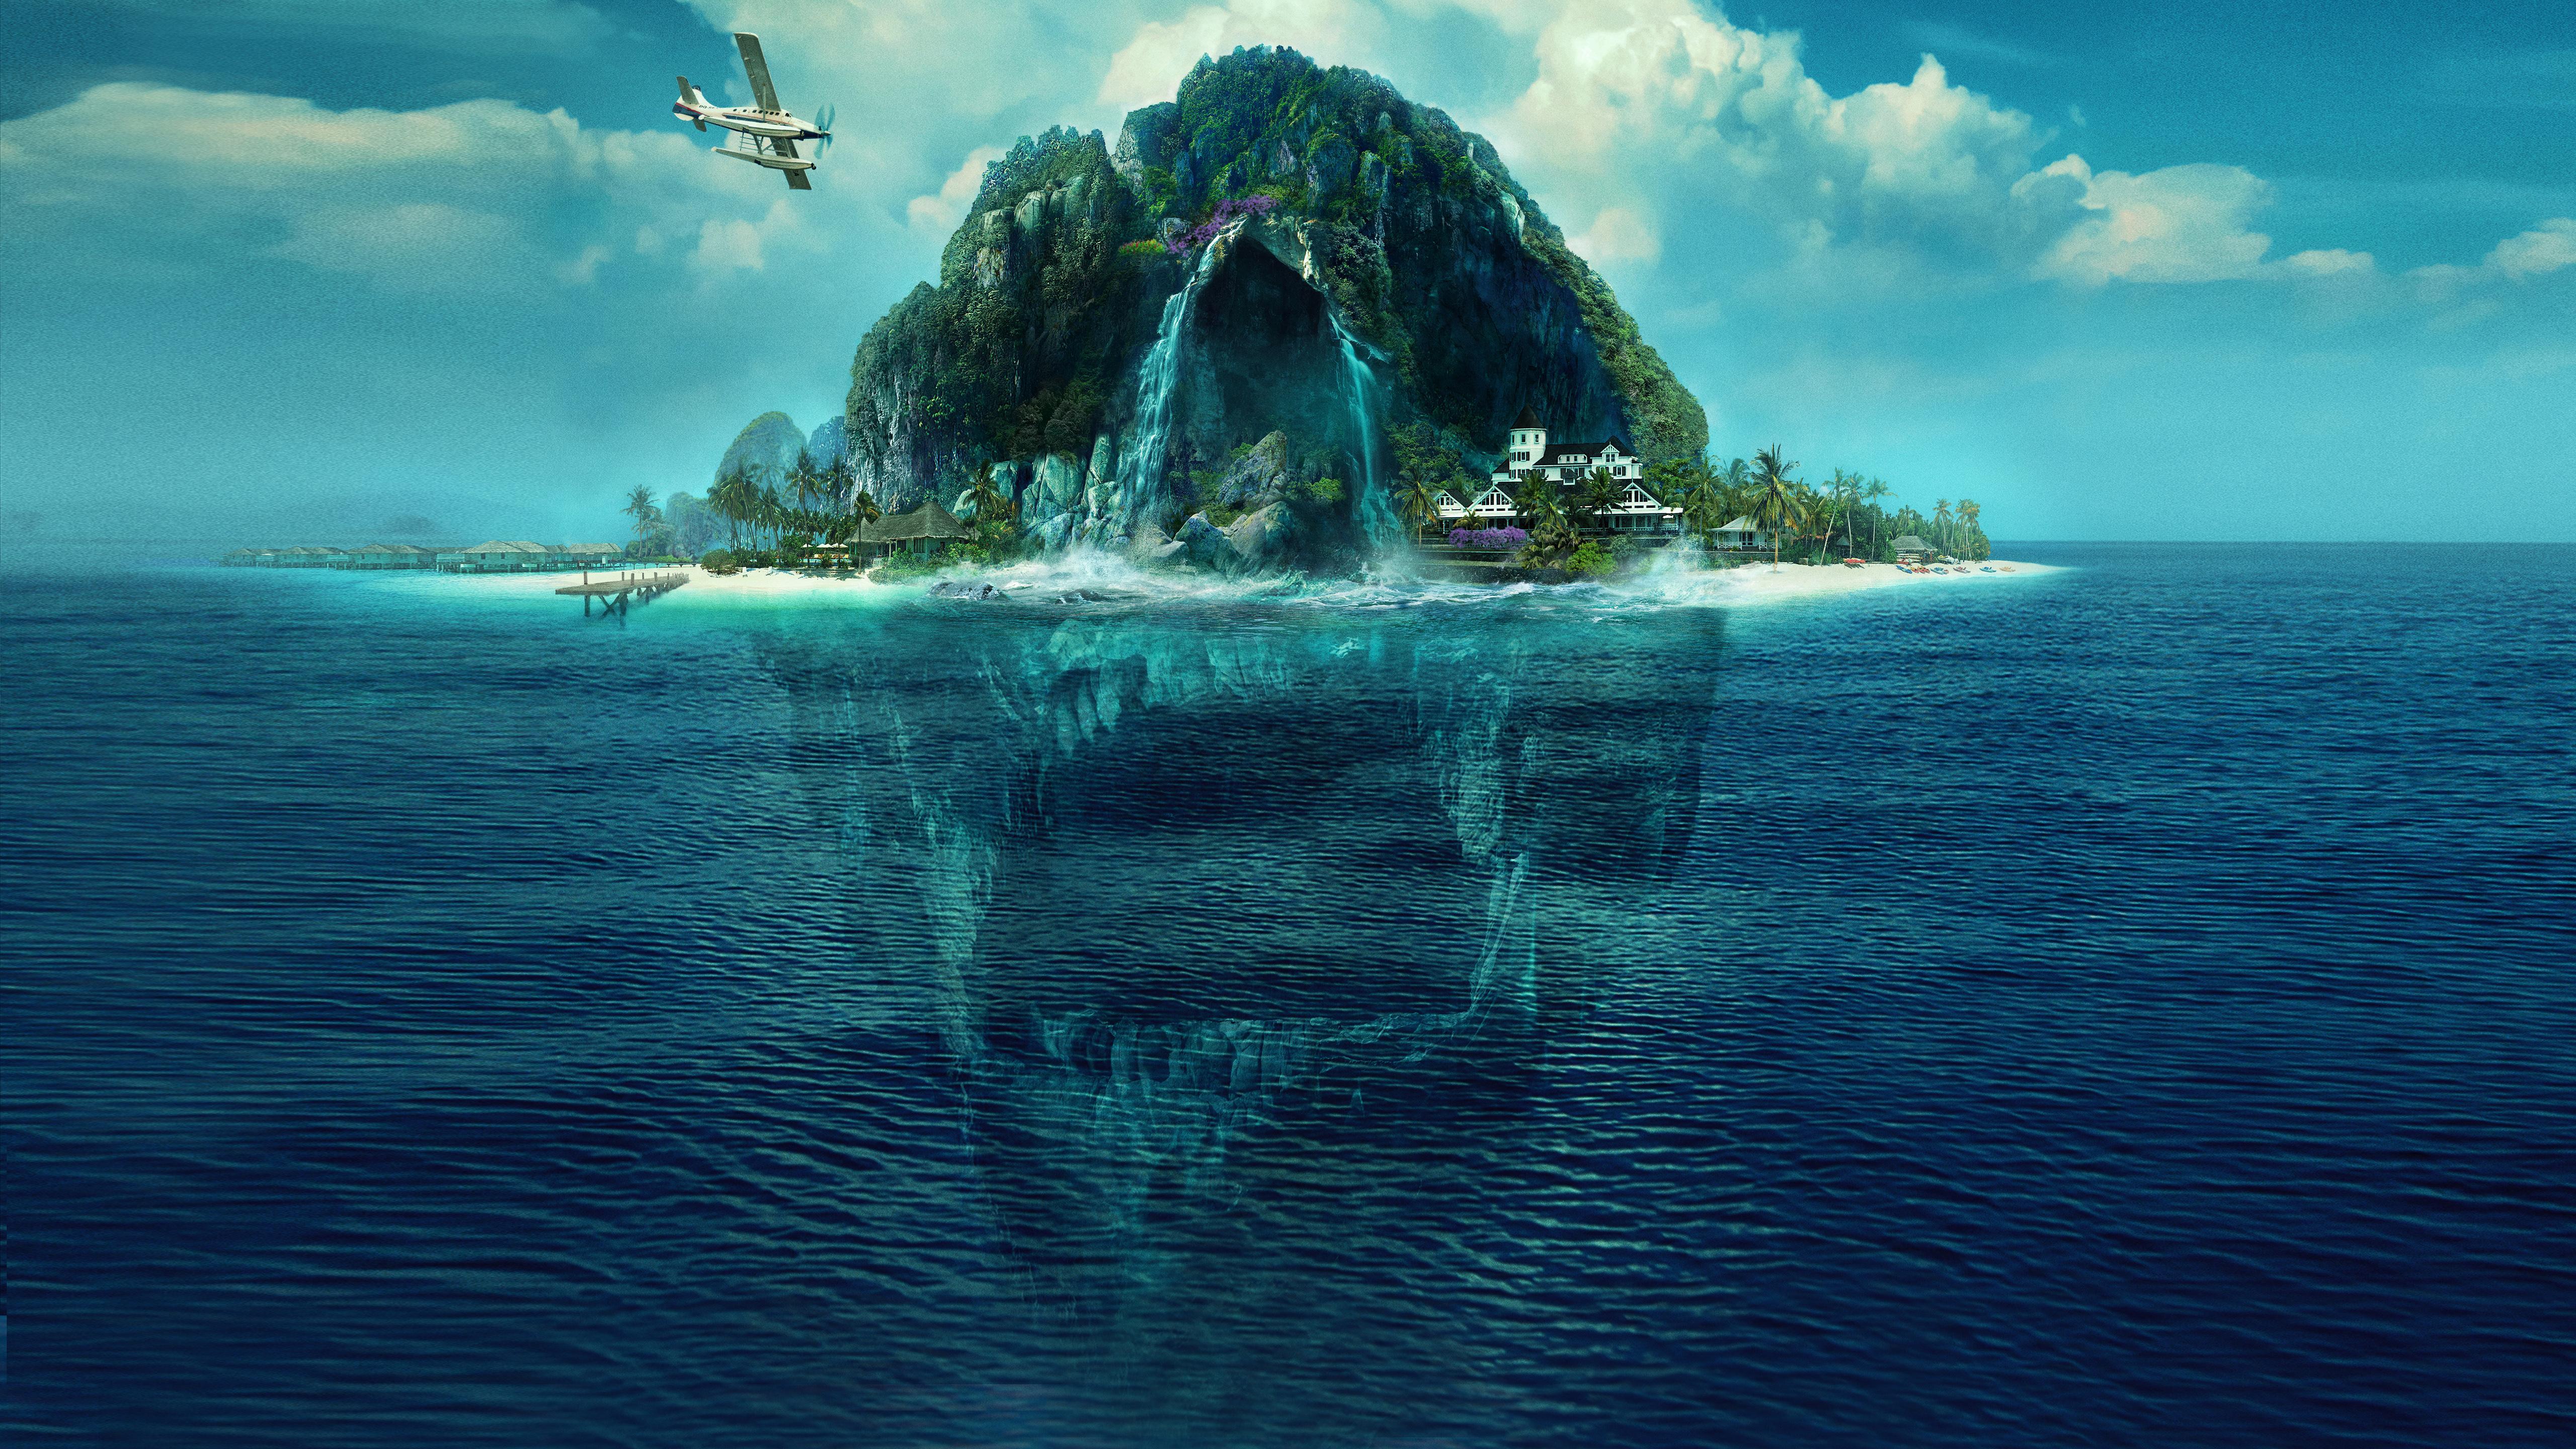 Fantasy Island 2020 4K 5K HD desktop wallpaper Widescreen High 5120x2880